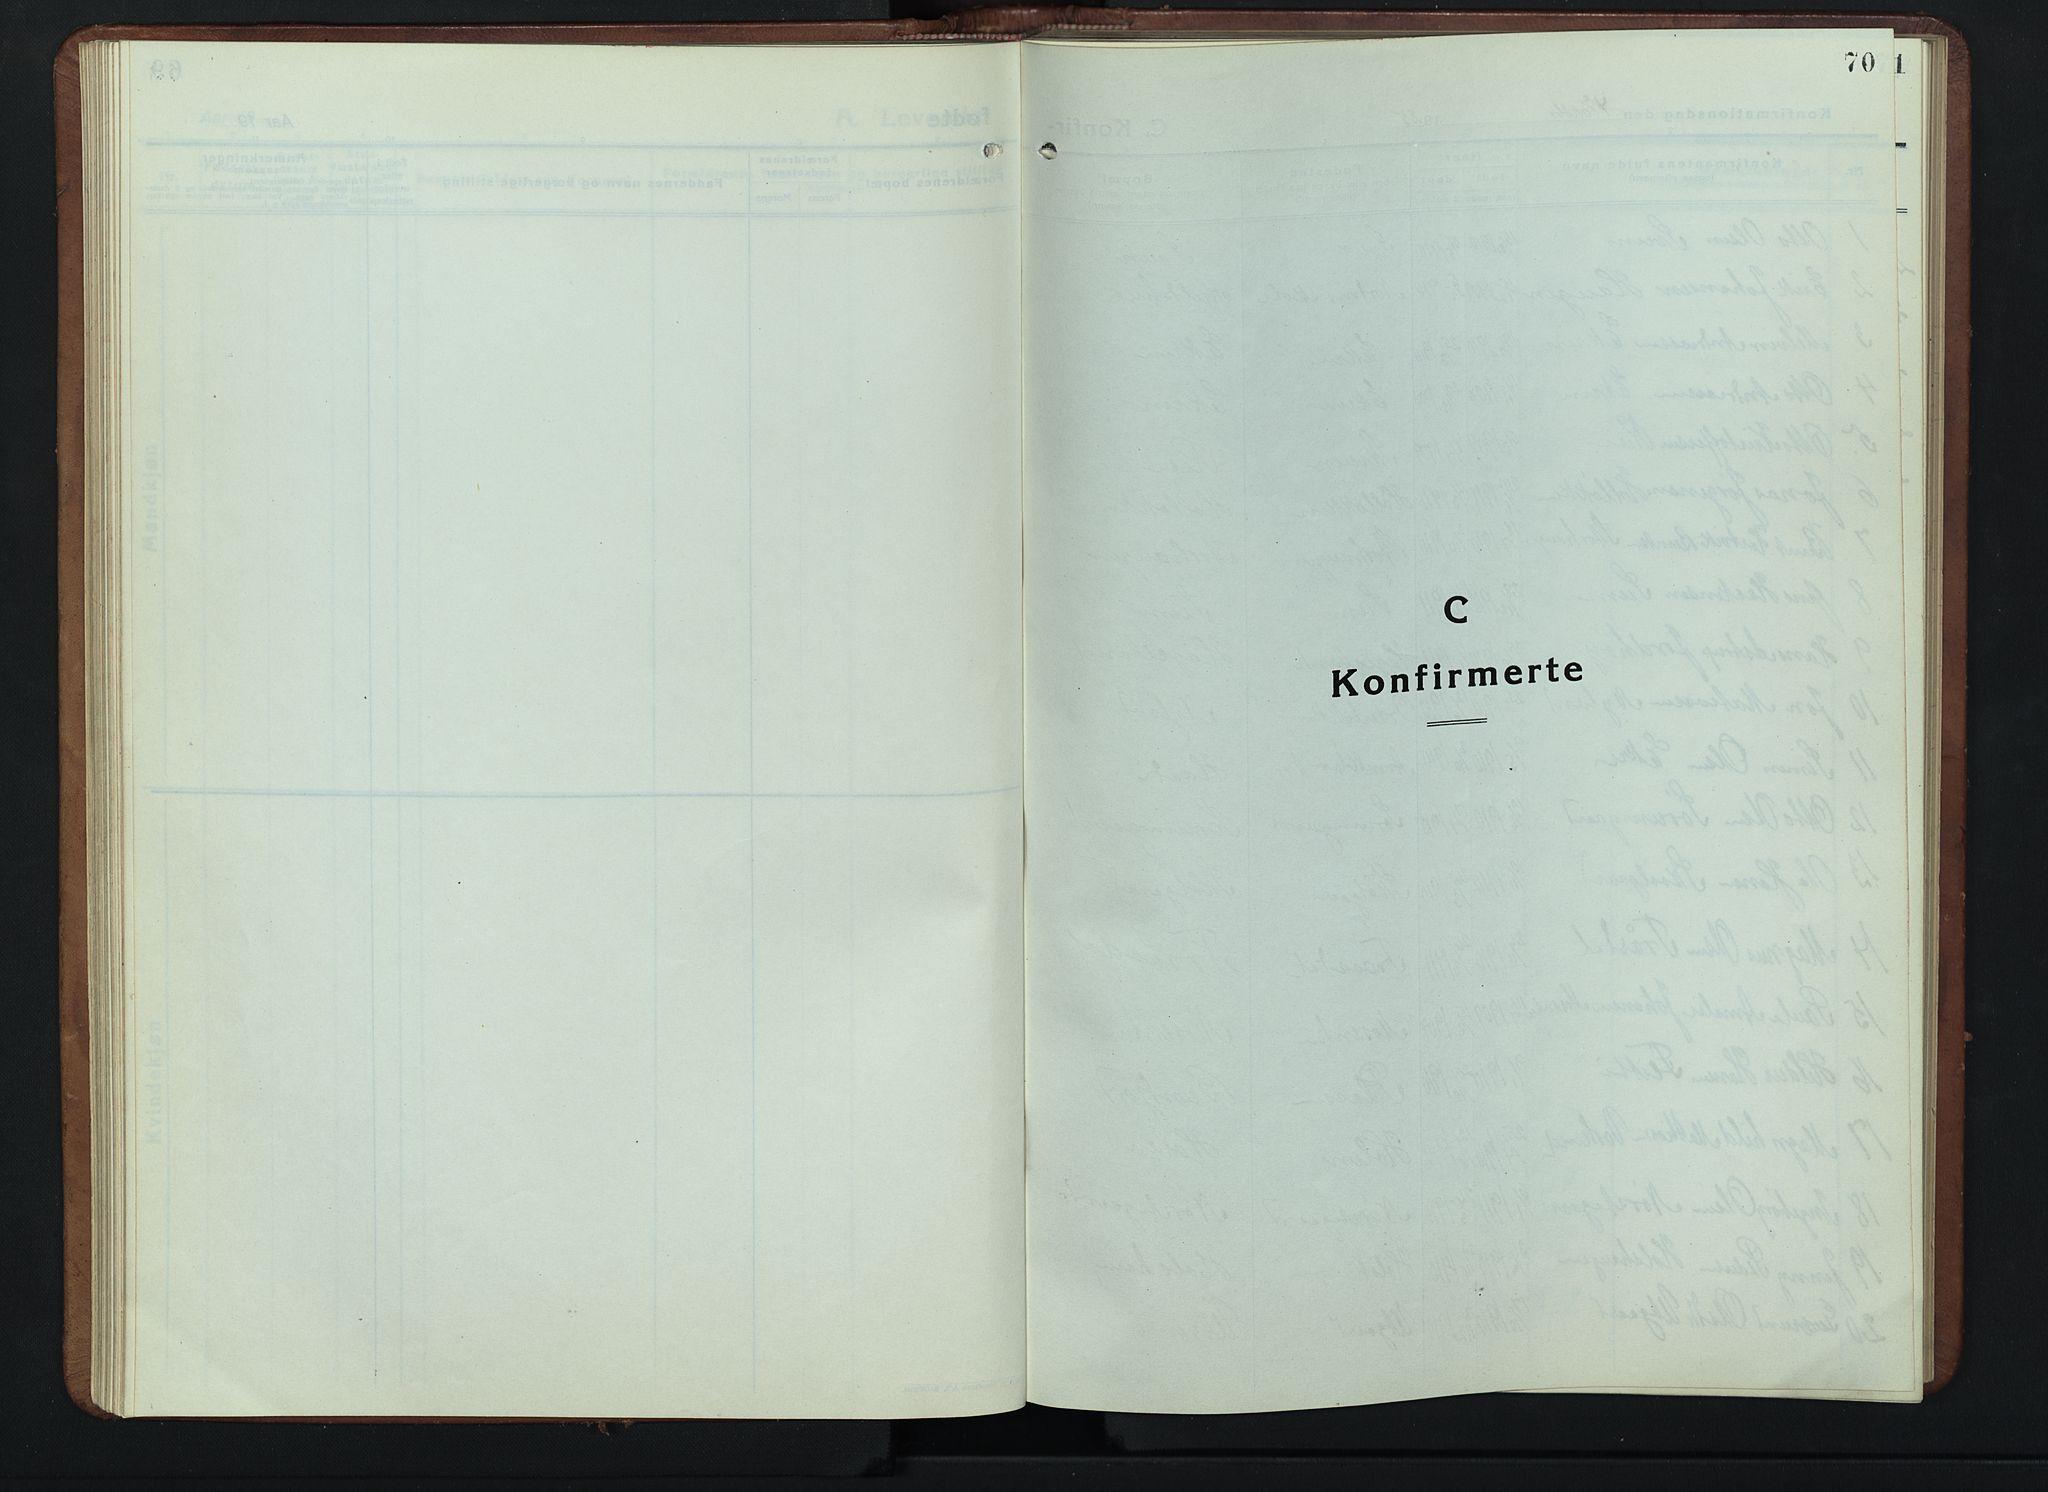 SAH, Lesja prestekontor, Klokkerbok nr. 9, 1924-1947, s. 70